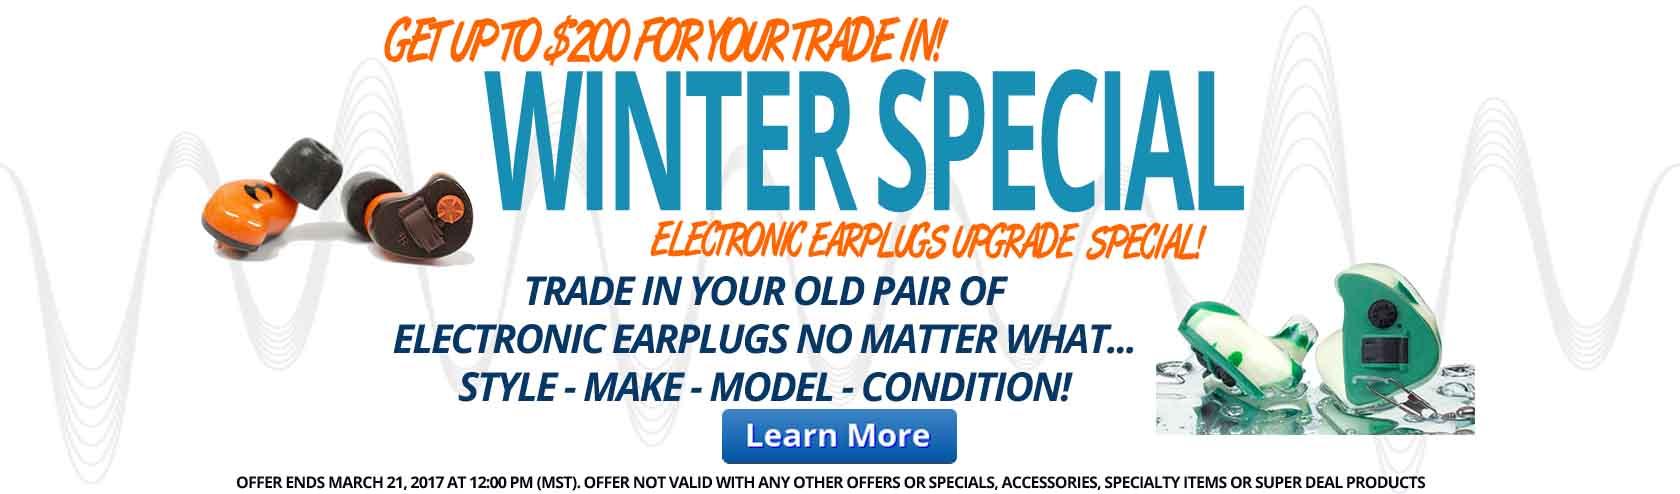 winterspecial_slider